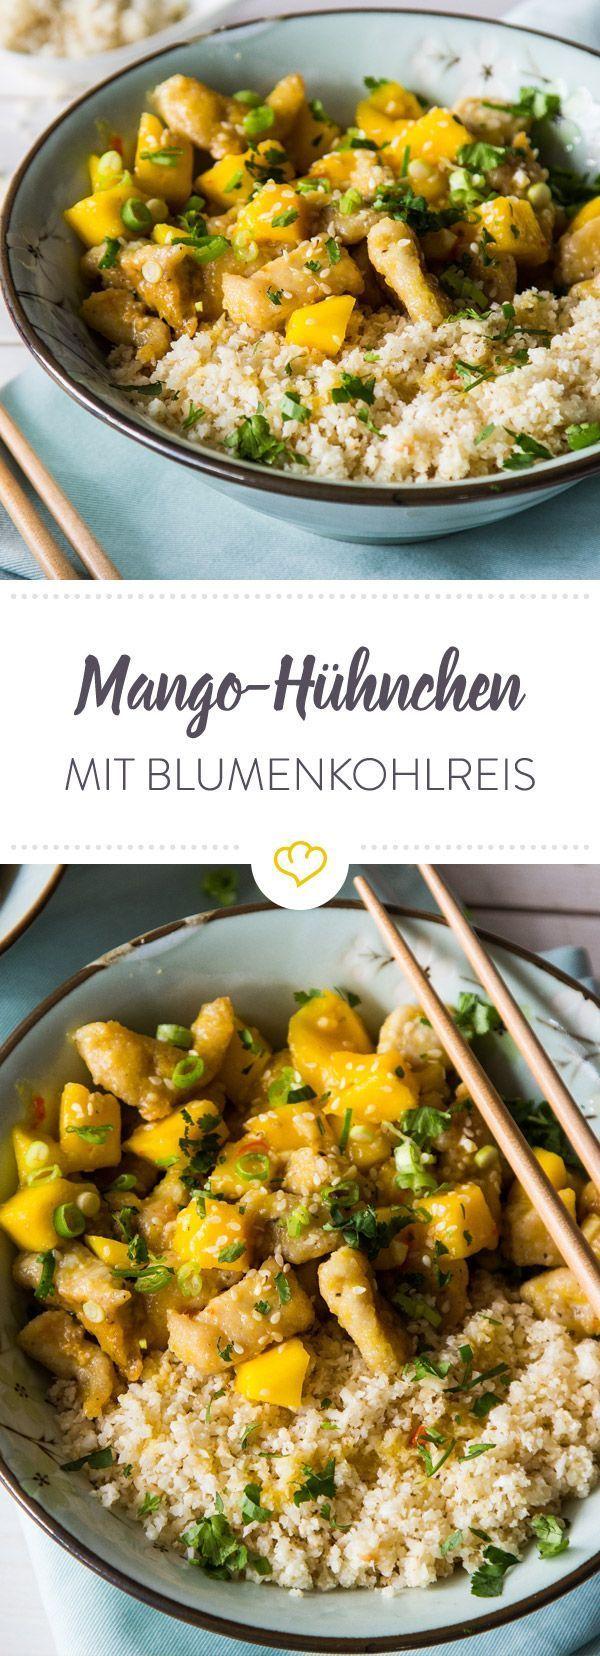 Schnelles Mango-Hühnchen mit Blumenkohl-Kokos-Reis